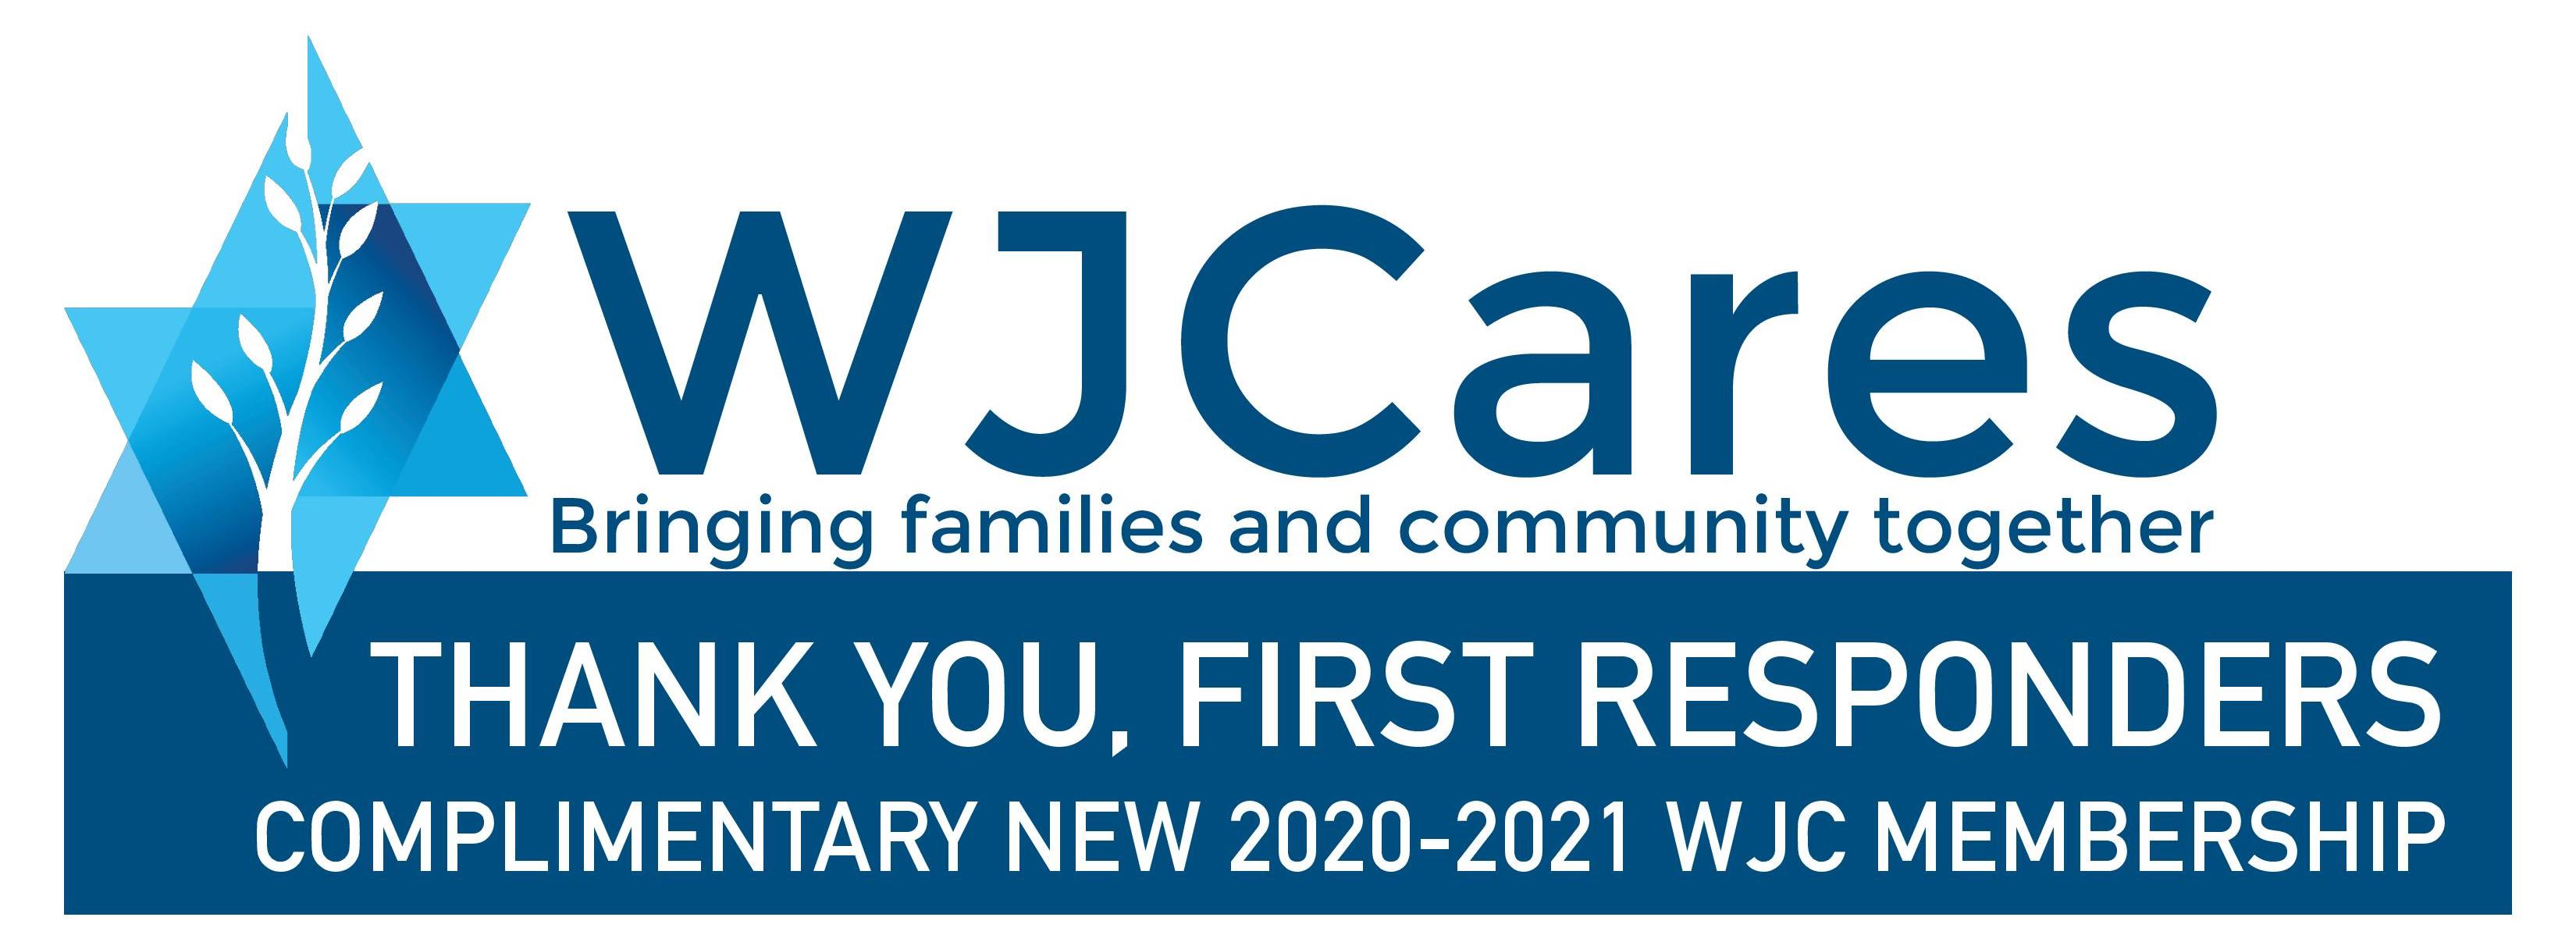 "<a href=""https://www.woodburyjc.org/membership-application-first-responder""                                     target="""">                                                                 <span class=""slider_title"">                                     Free Membership to First Responders                                </span>                                                                 </a>"